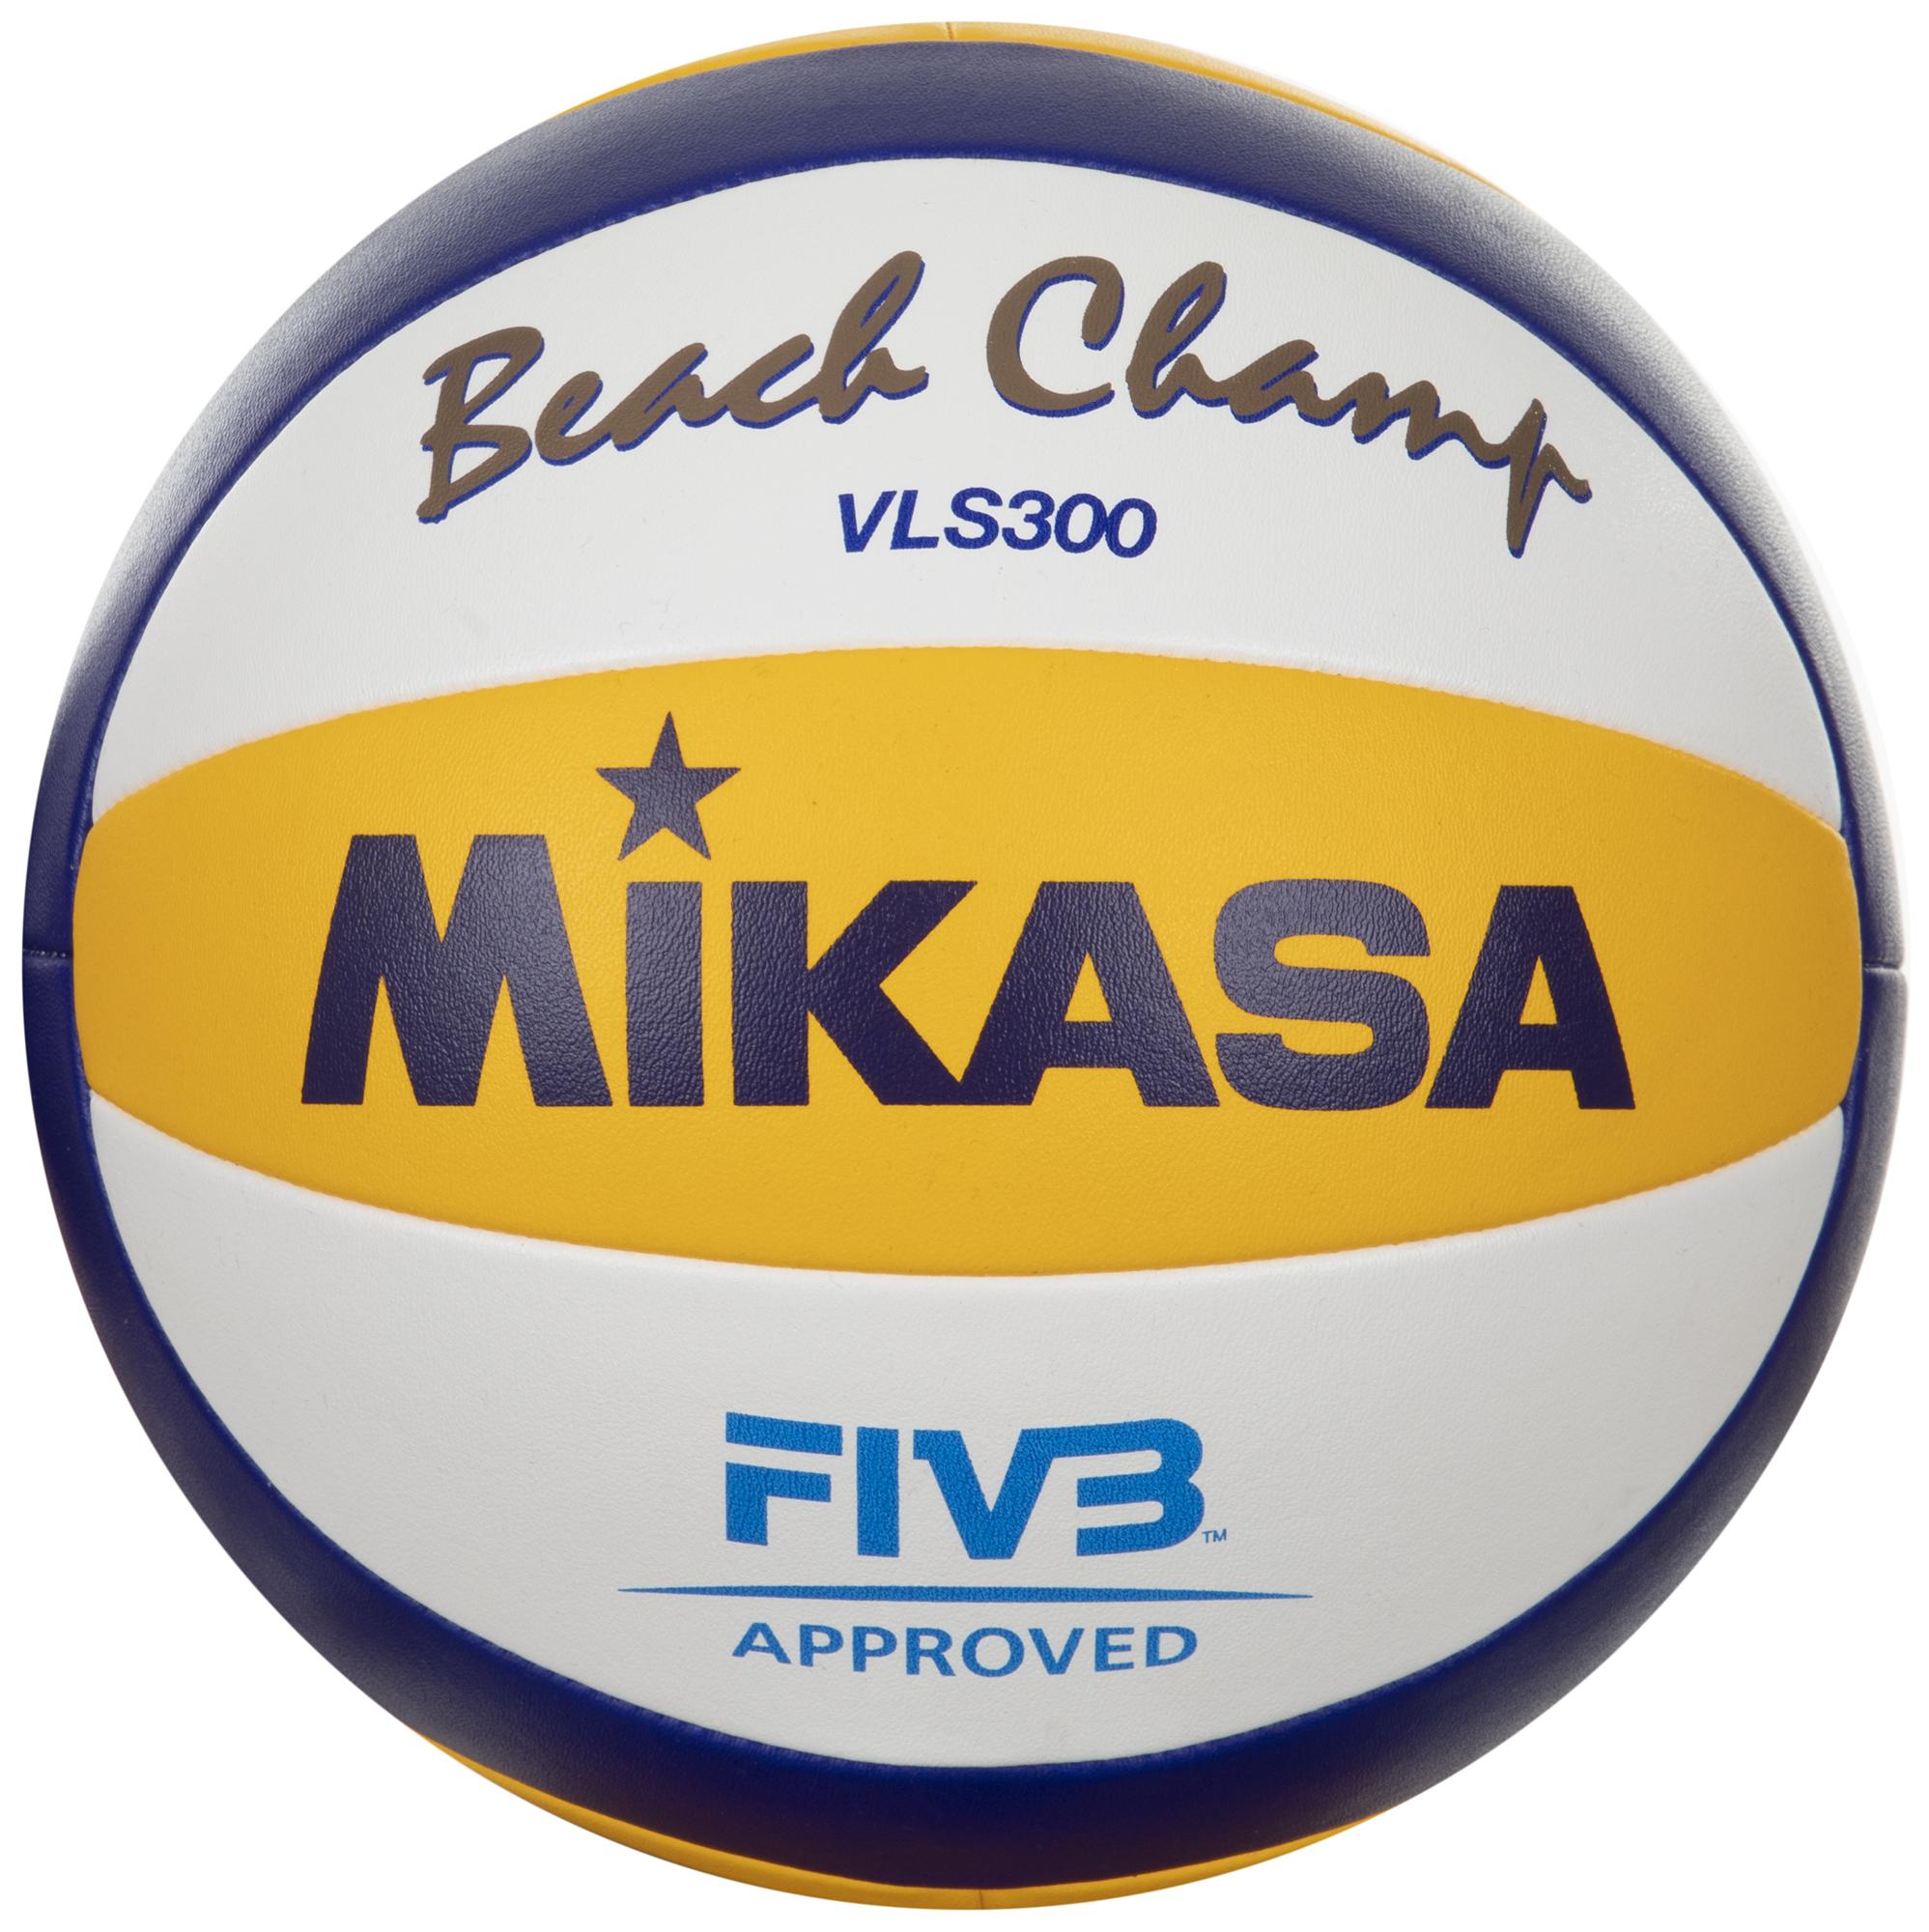 Mikasa Мяч волейбольный MIKASA VLS 300 цены онлайн